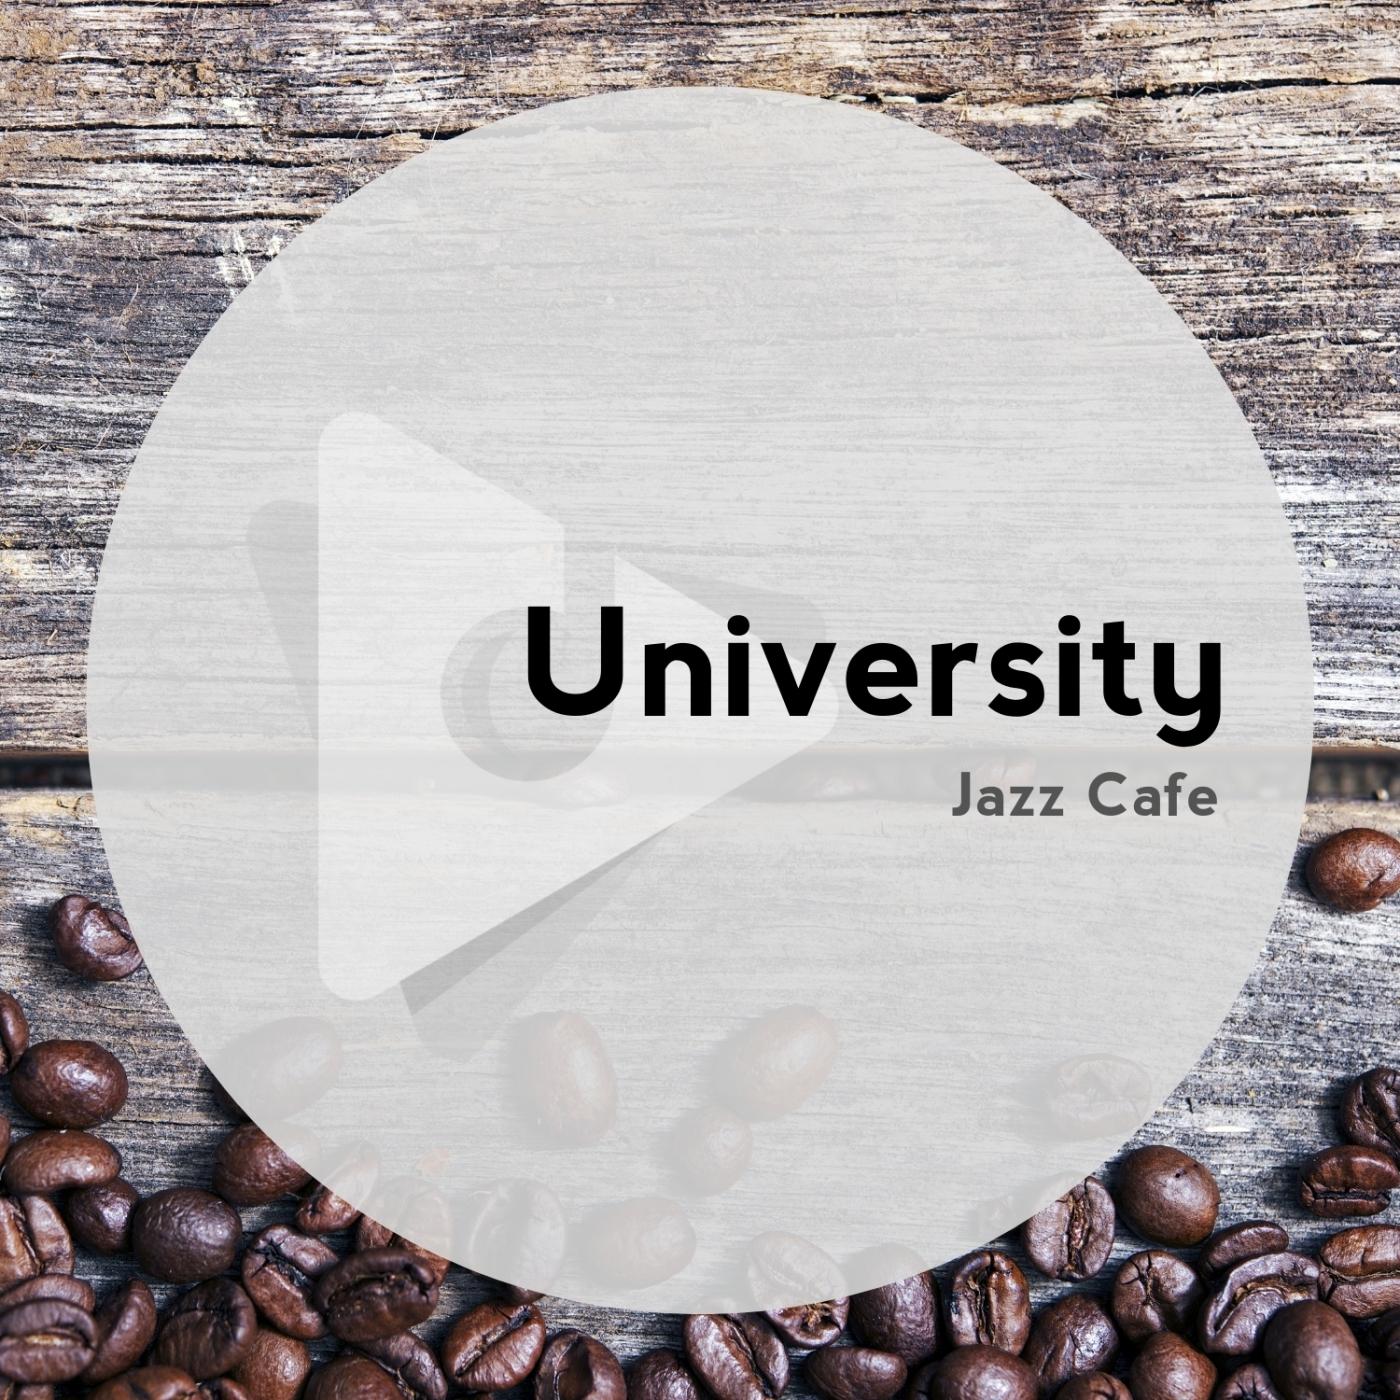 University Jazz Cafe